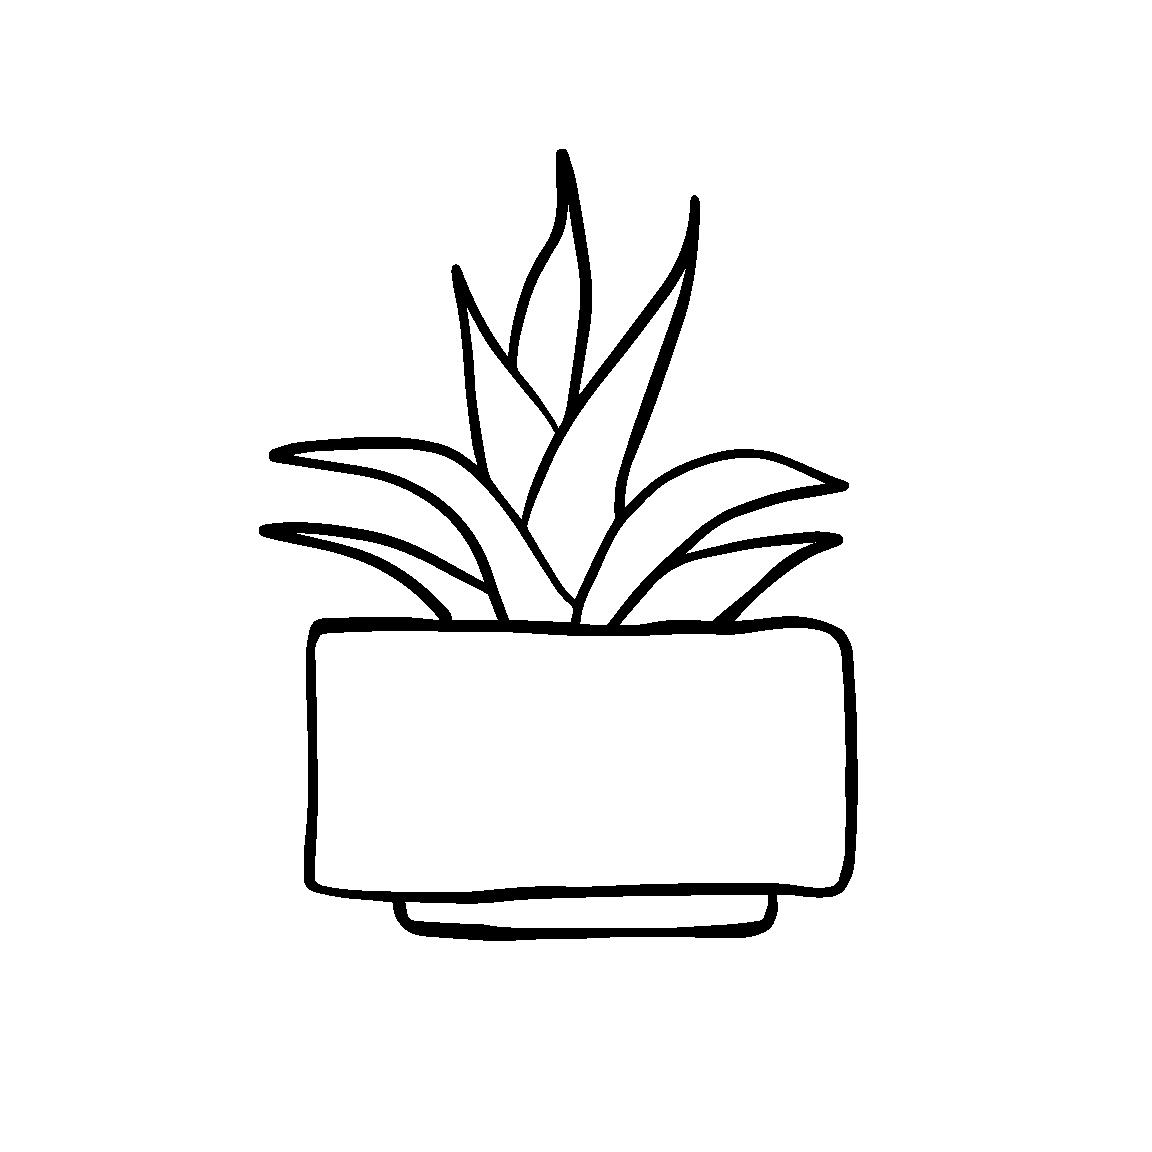 Cactus_Black_5.png